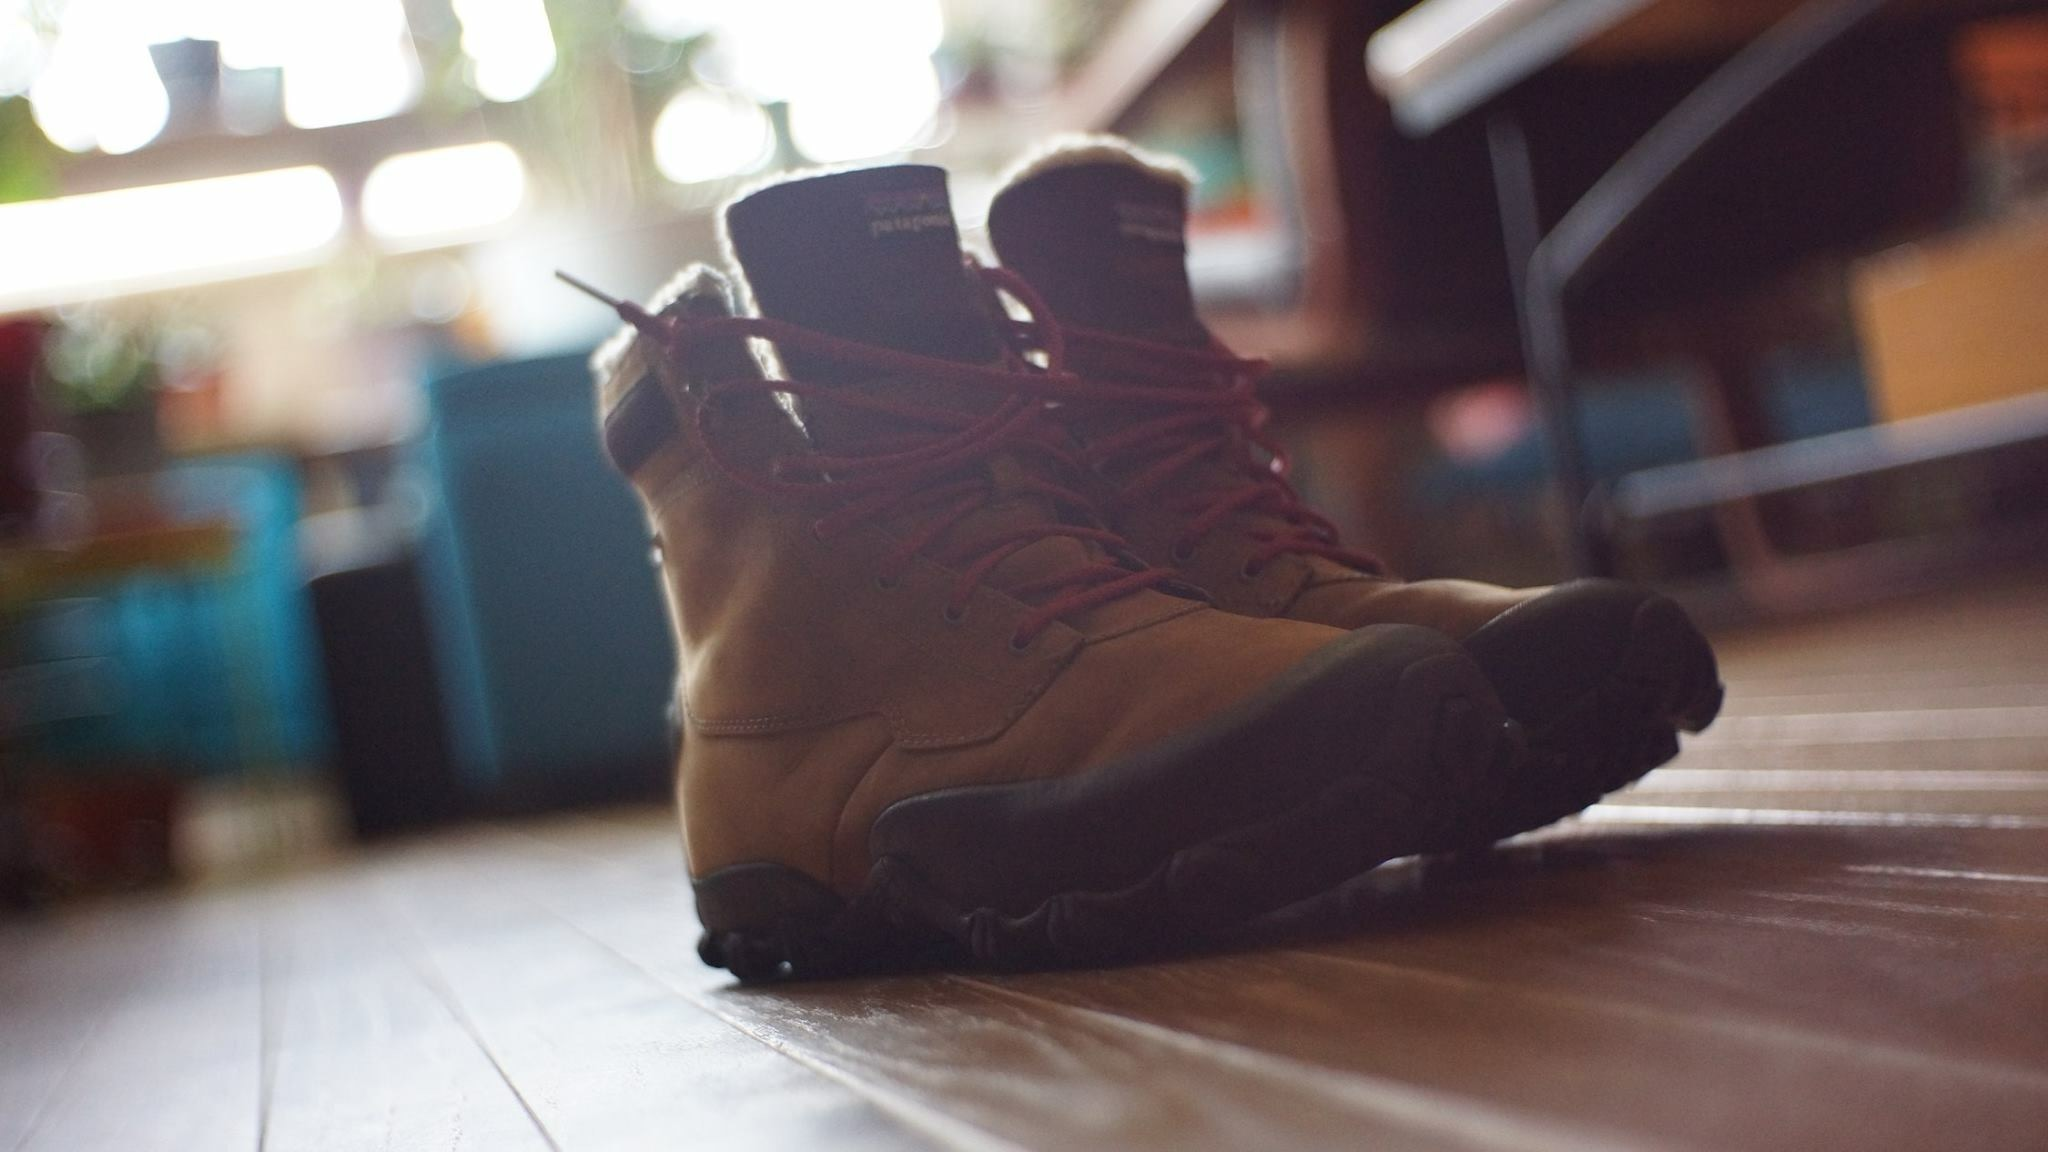 Patagonia Boots Drifter Fujian 35mm 1.6 lens on Sony Nex-7 Body